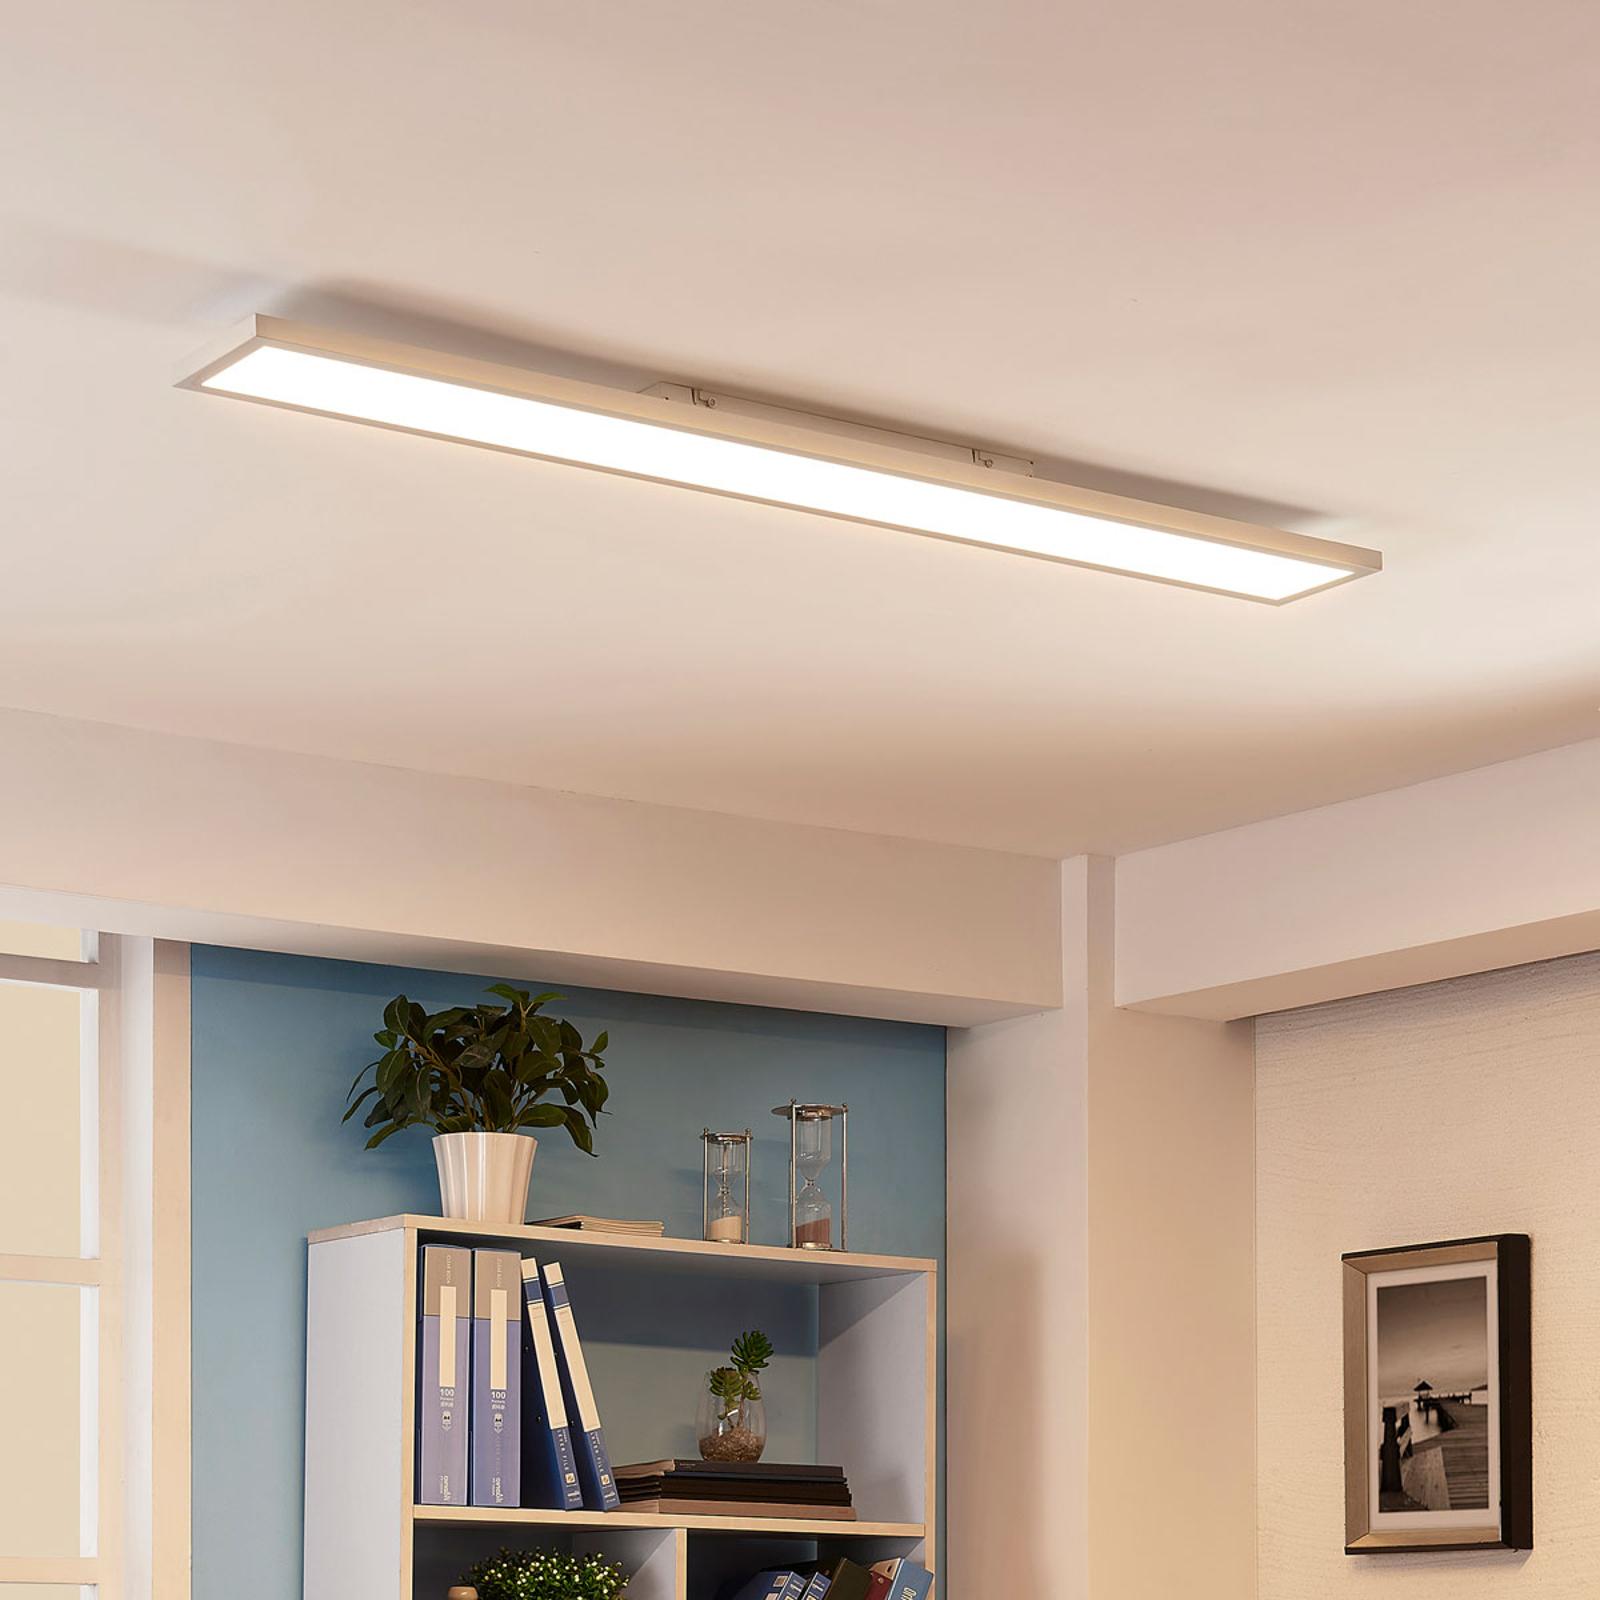 Plafonnier LED allongé Enora, 40 W